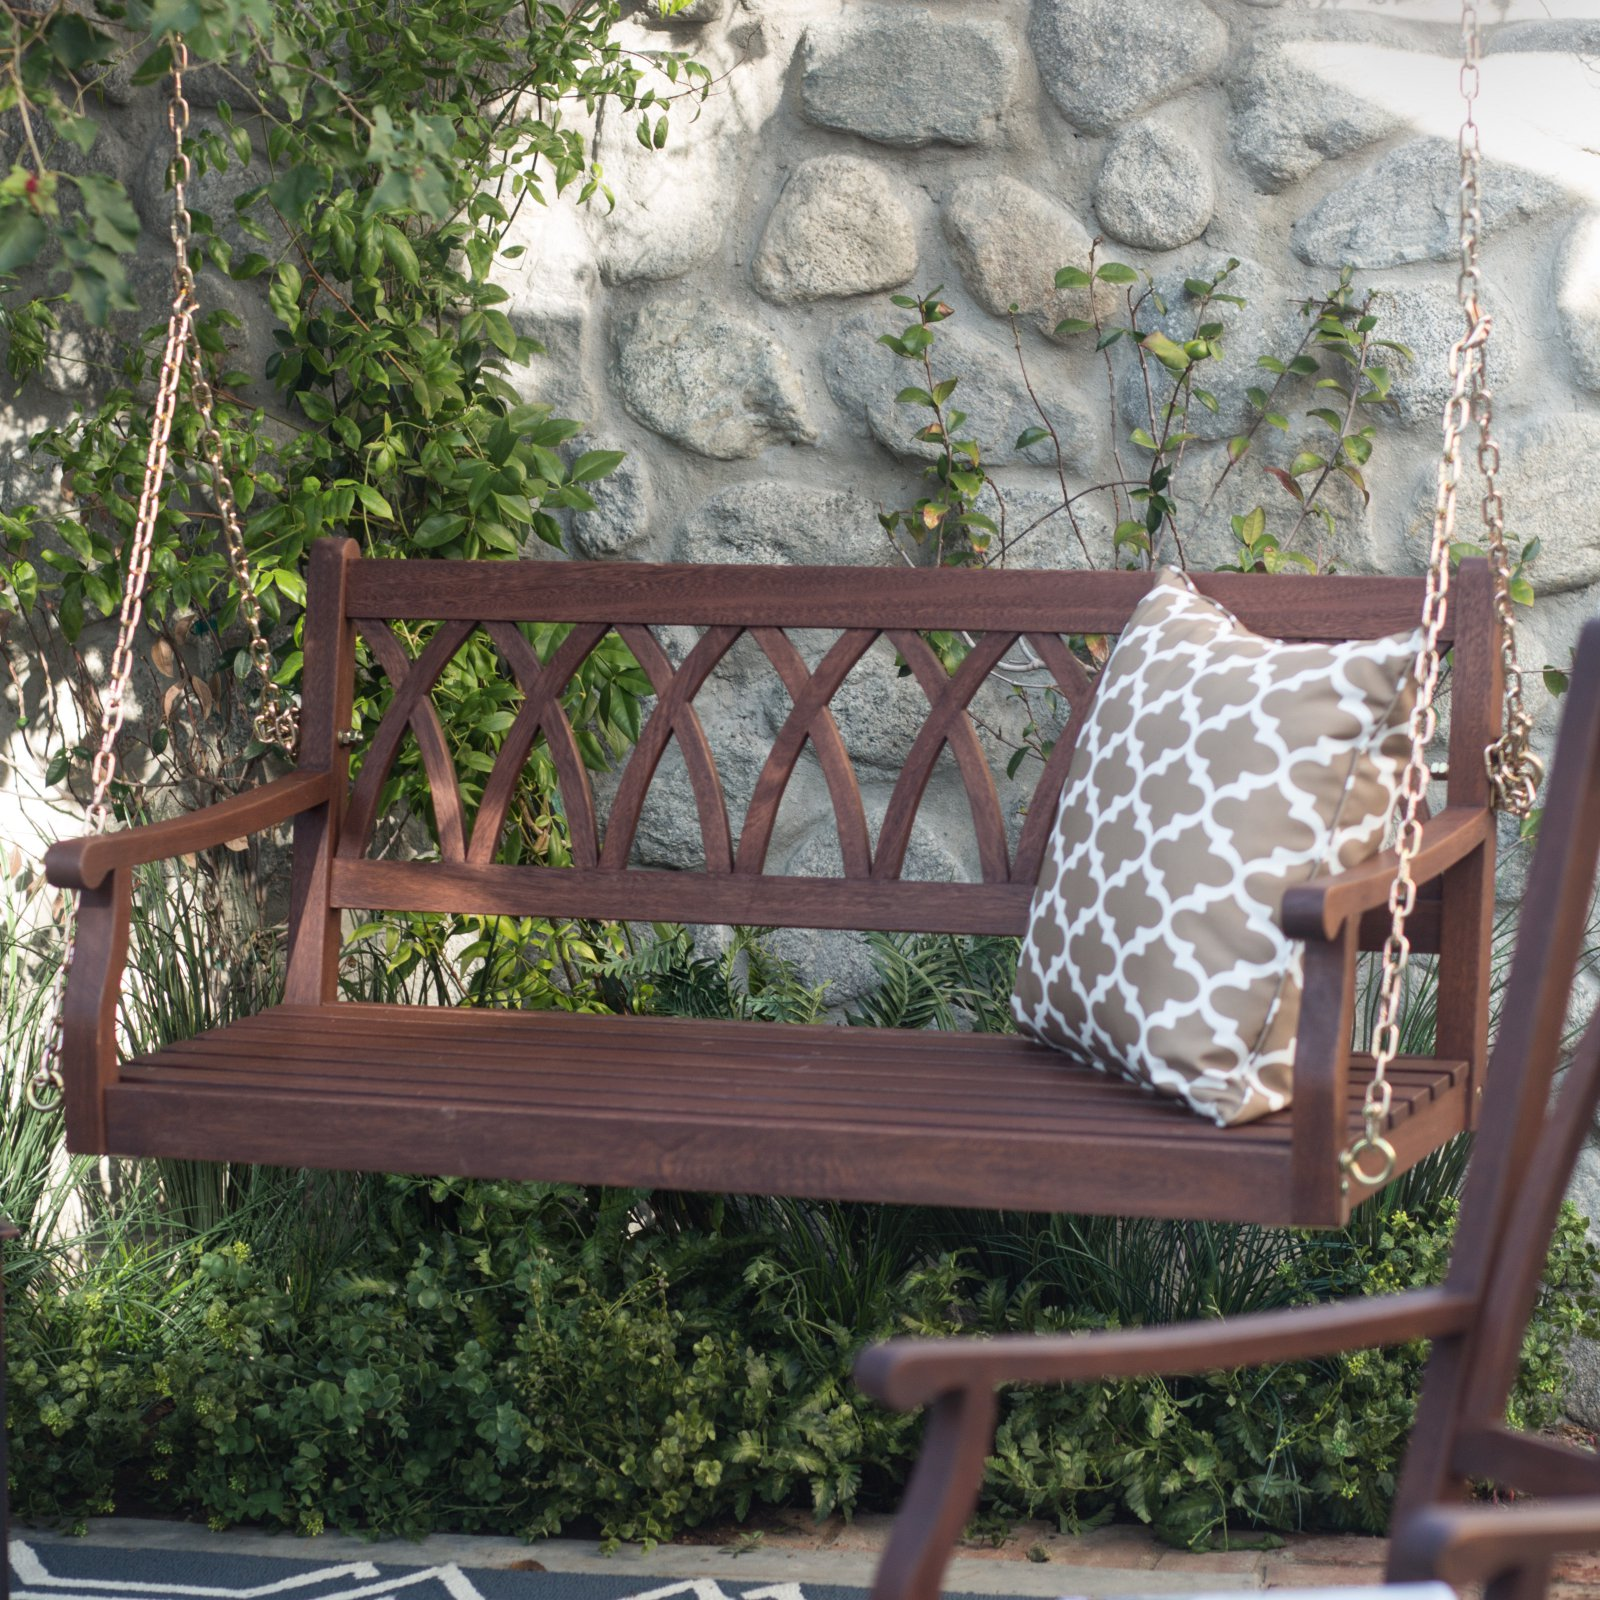 Belham Living Ashbury 4 ft. Wood Porch Swing Dark Brown by